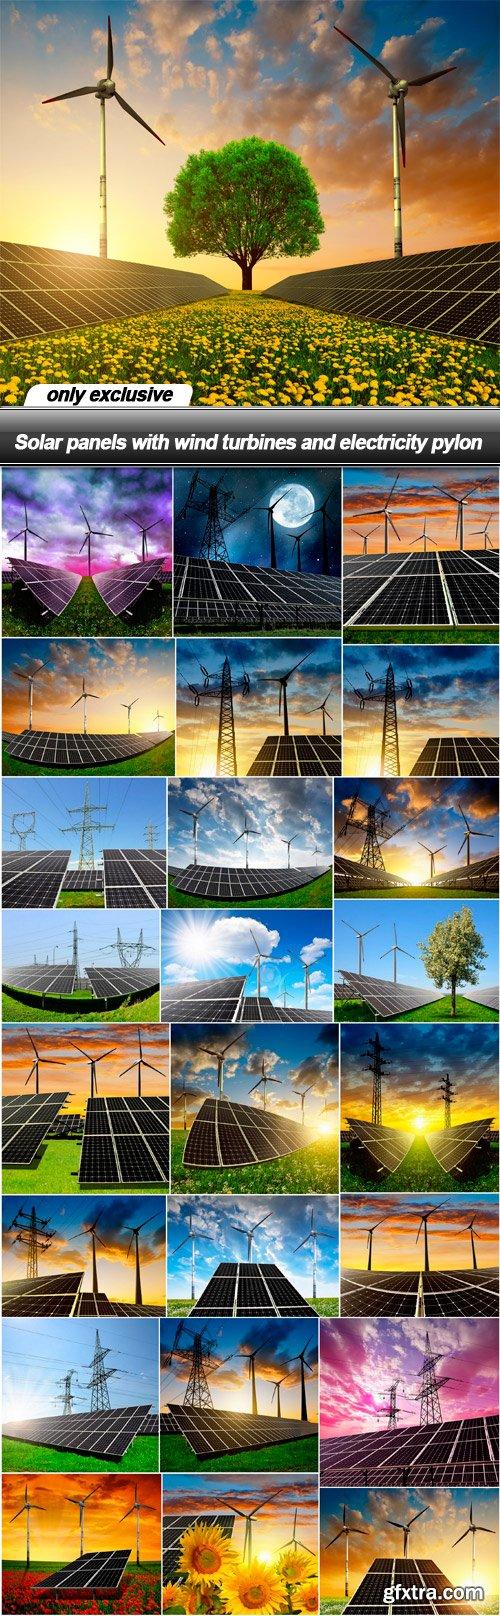 Solar panels with wind turbines and electricity pylon - 25 UHQ JPEG